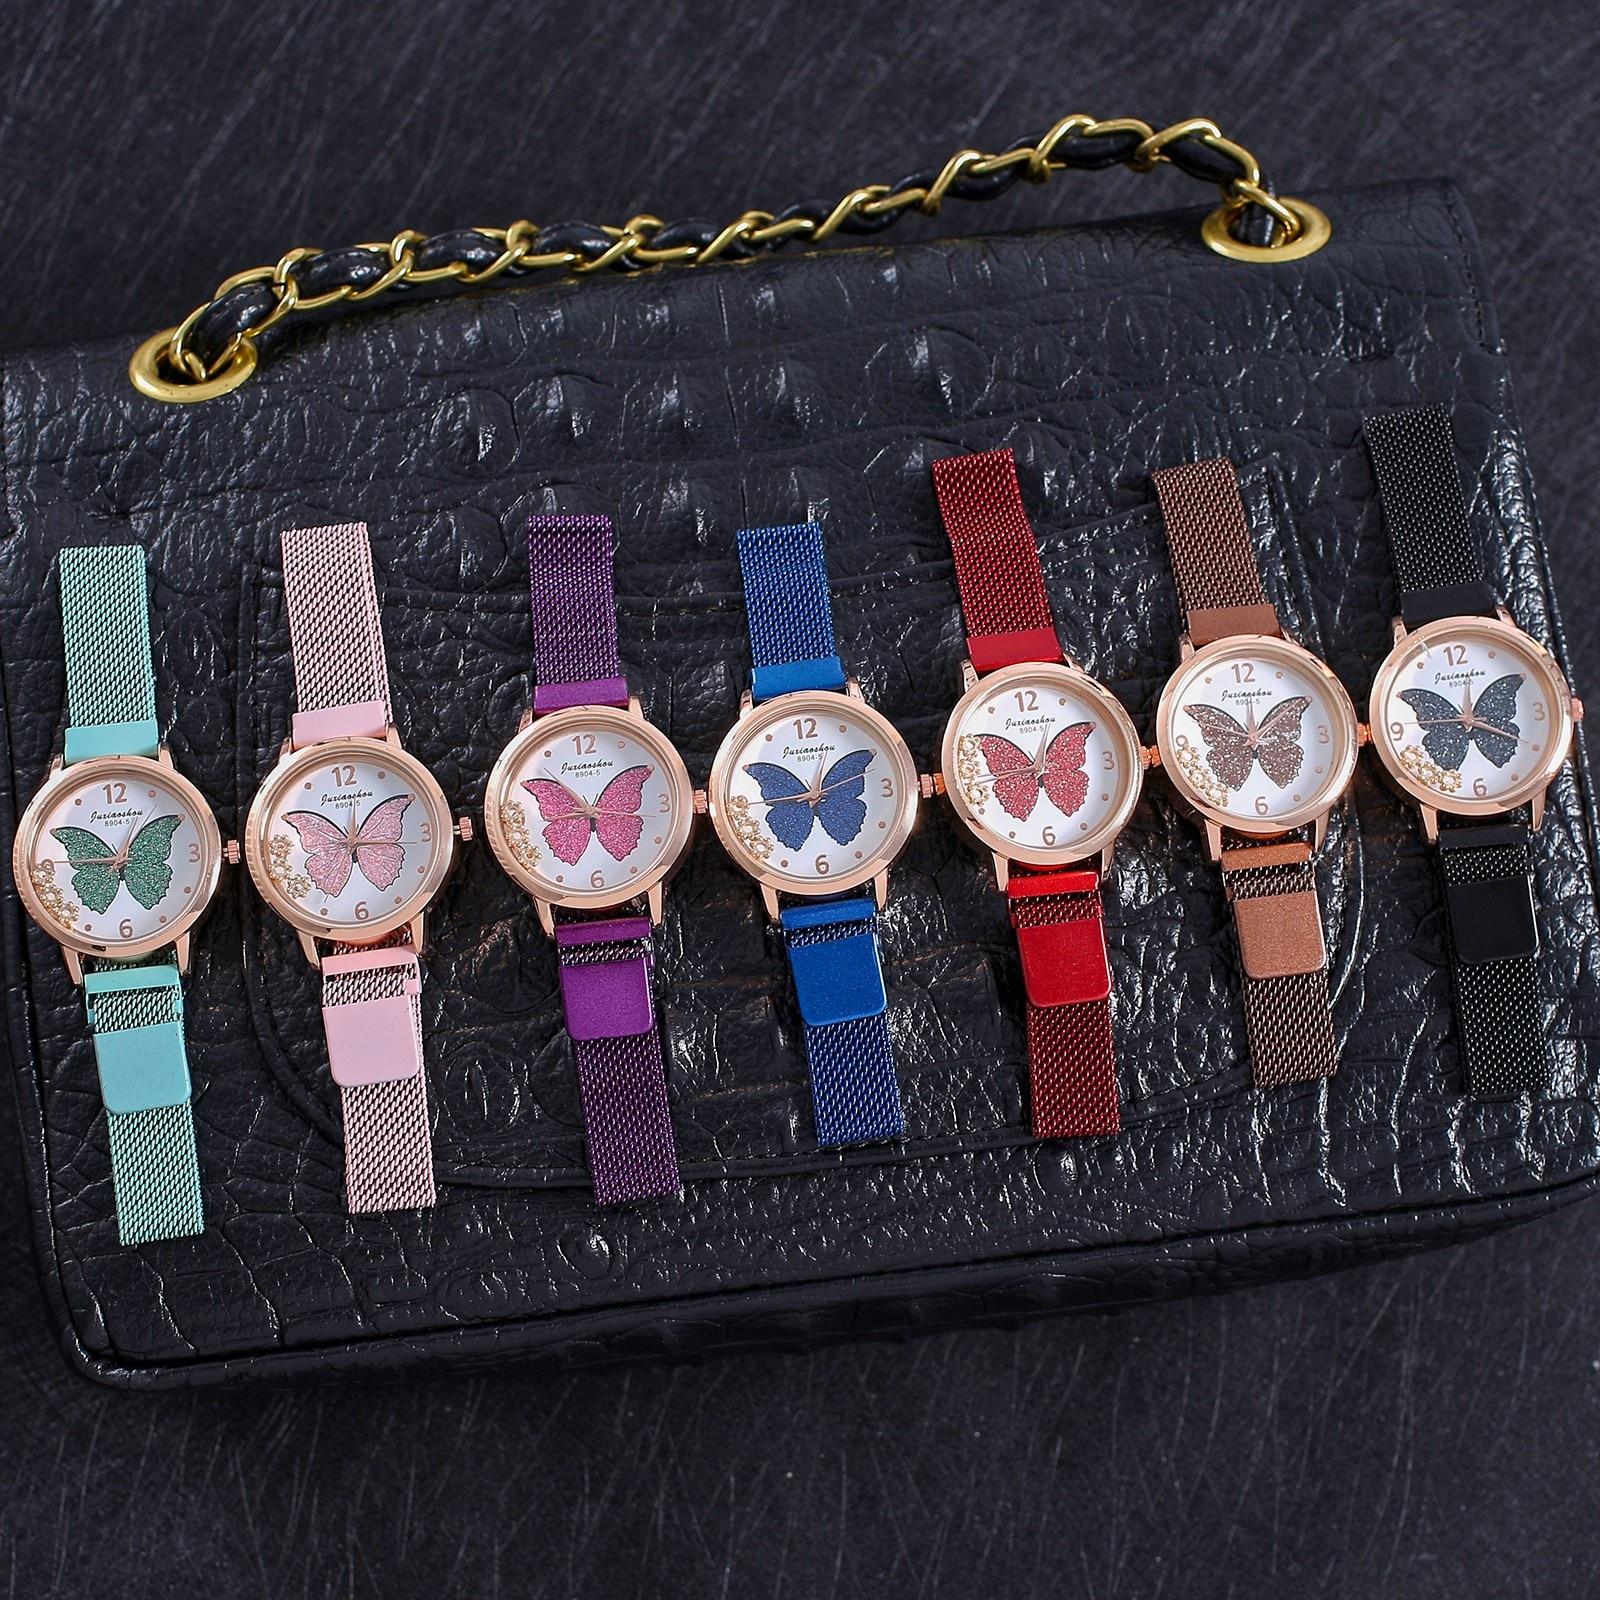 Butterfly Print Watch for Woman montre femme Analog Quartz Wrist Watch Party Dress Bracelet Clock re